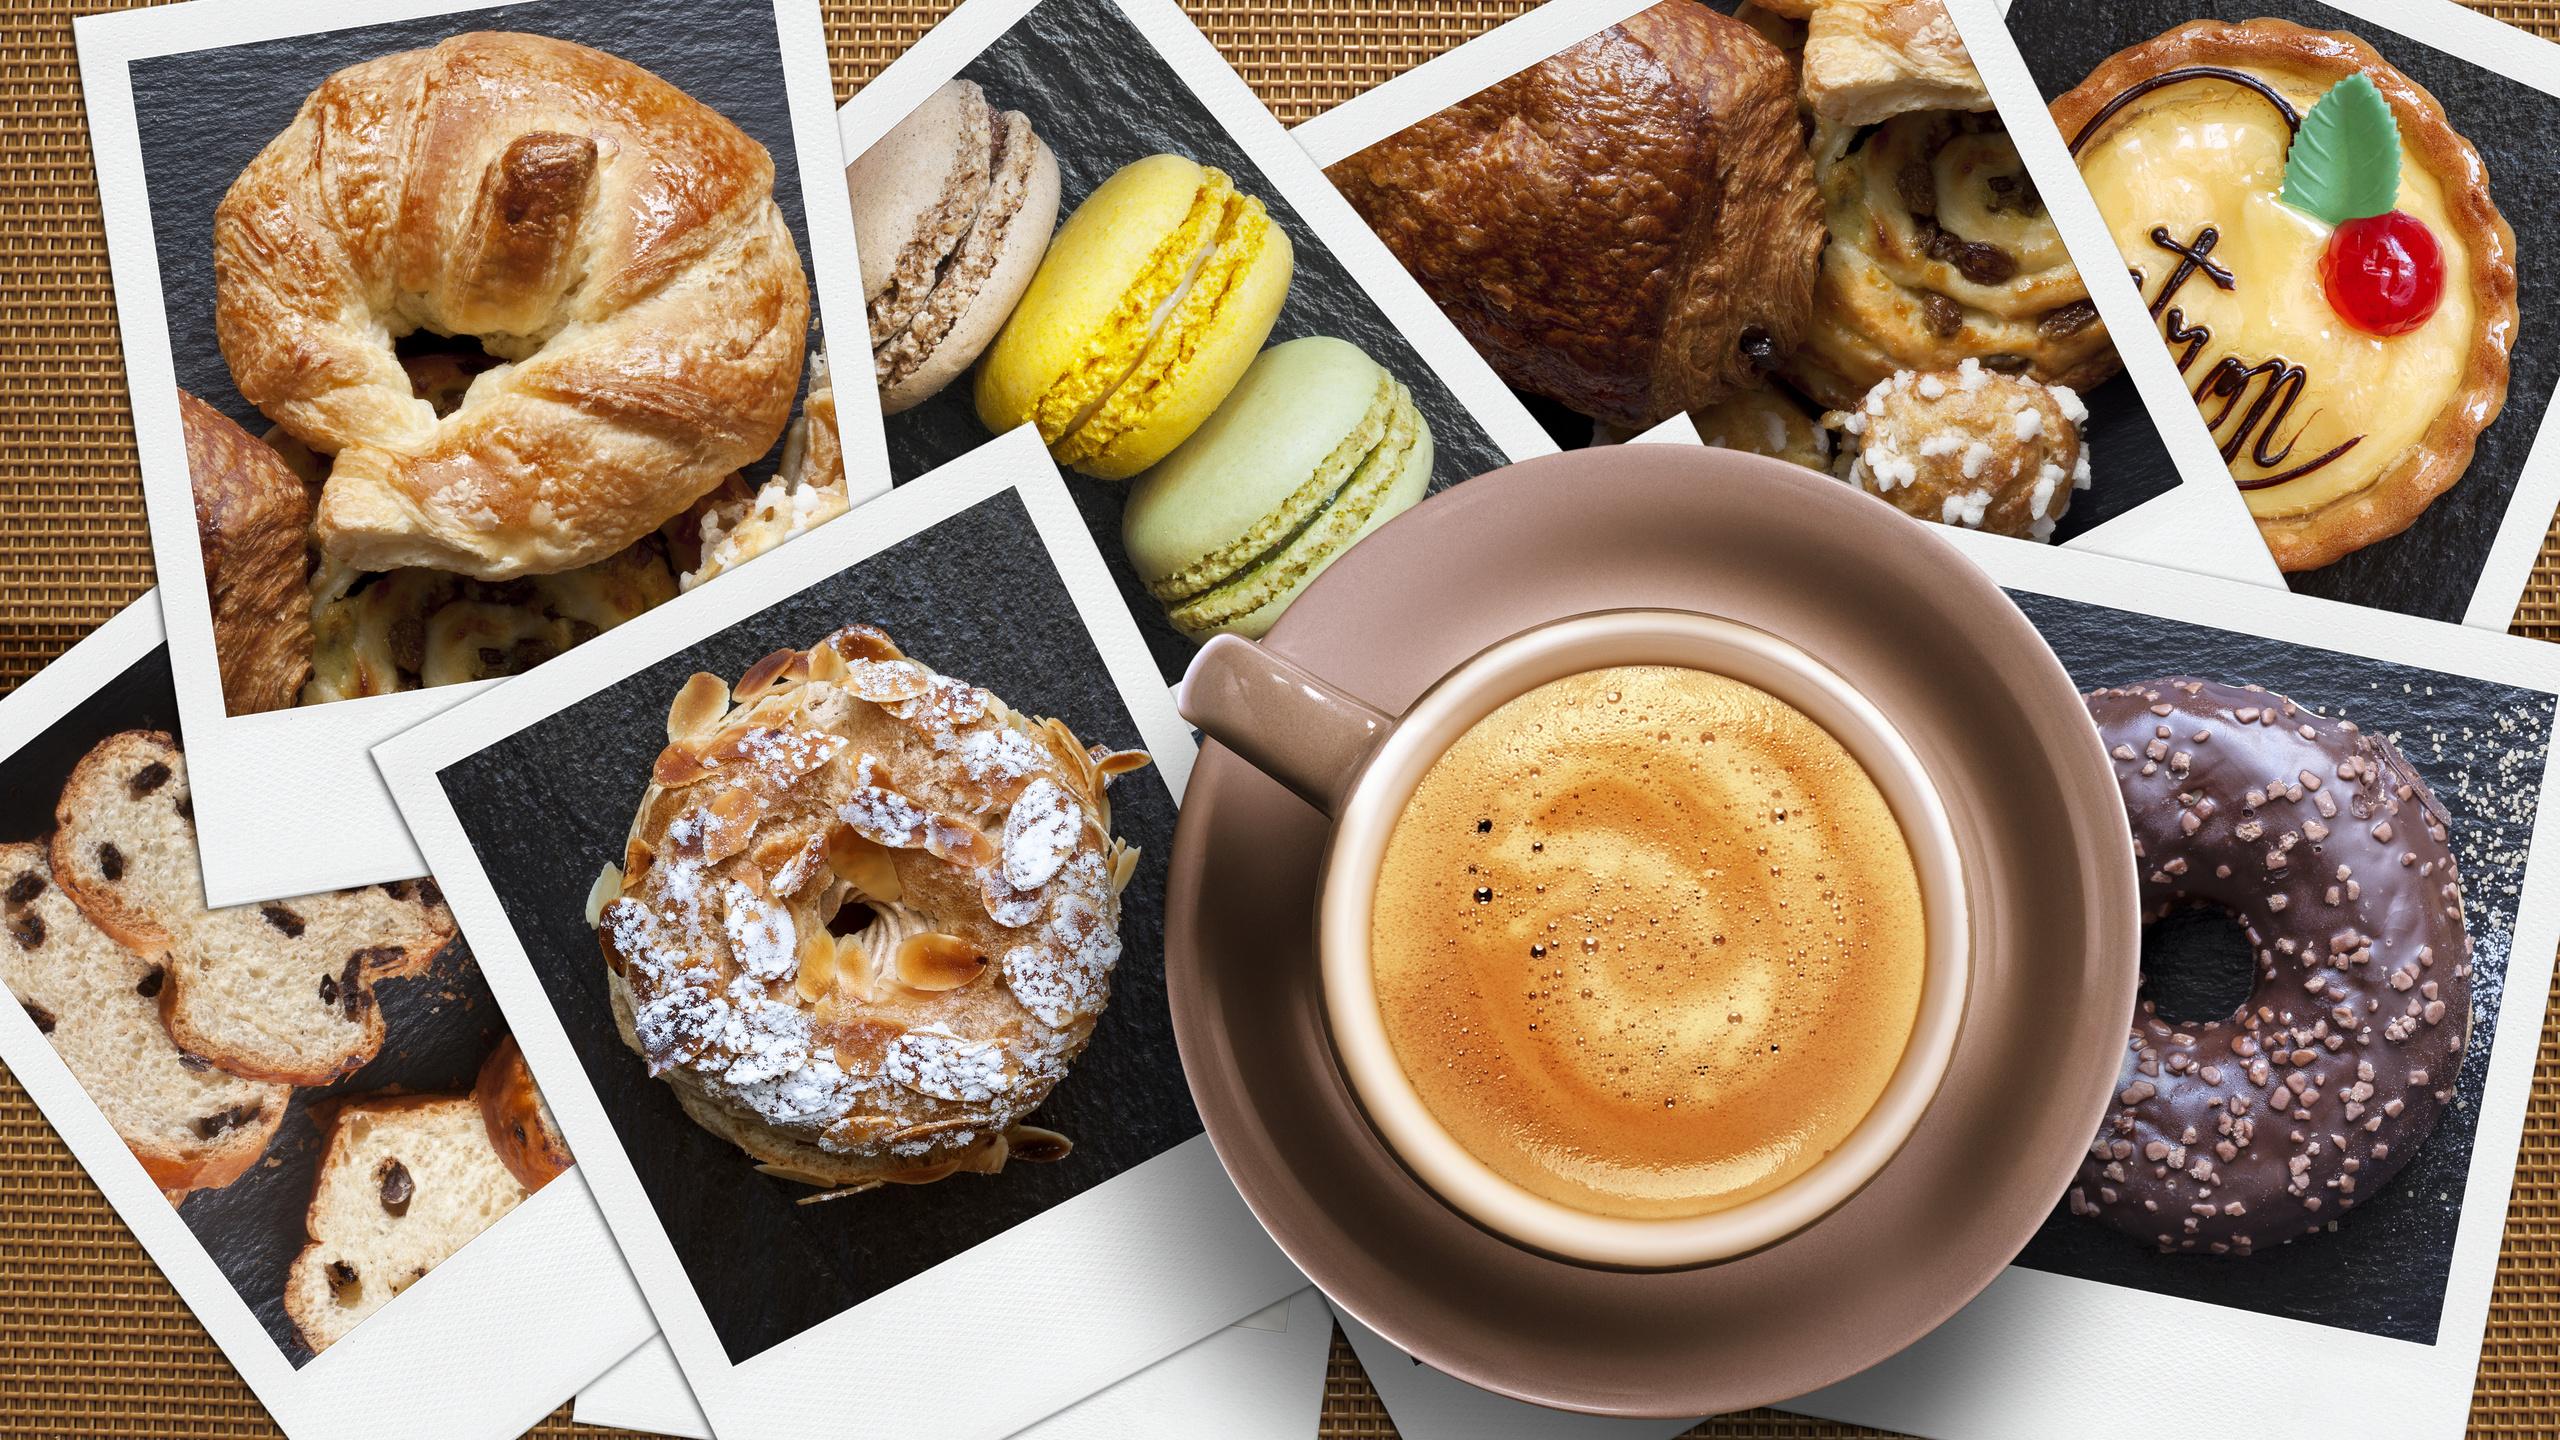 кофе, капучино, круассан, выпечка, Чашка